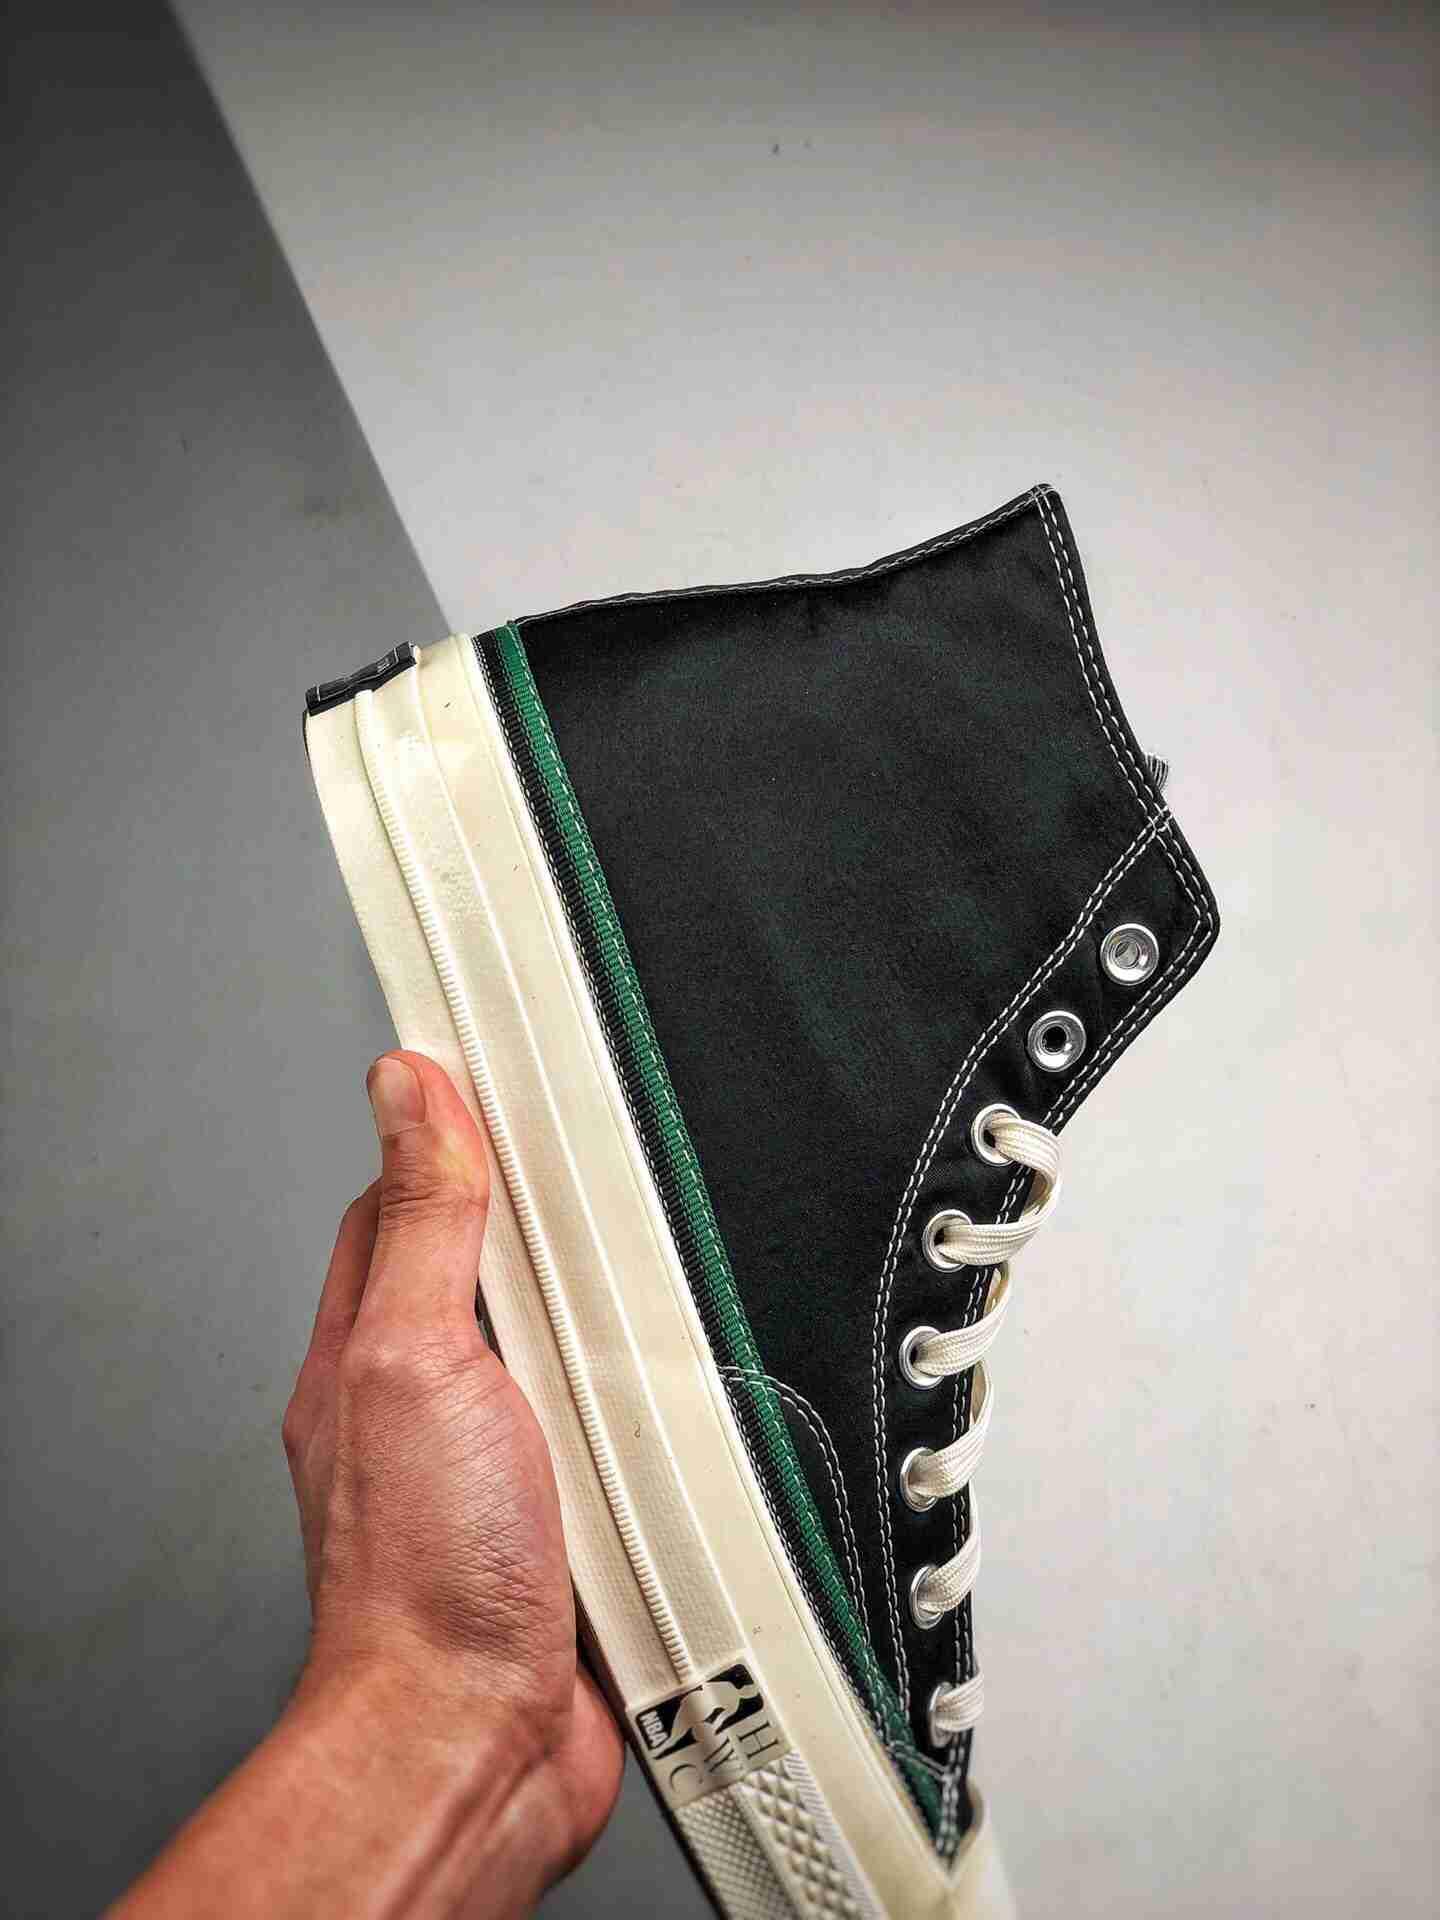 Converse Chuck Taylor 70s  NBA限量联名丝绸高帮硫化帆布鞋